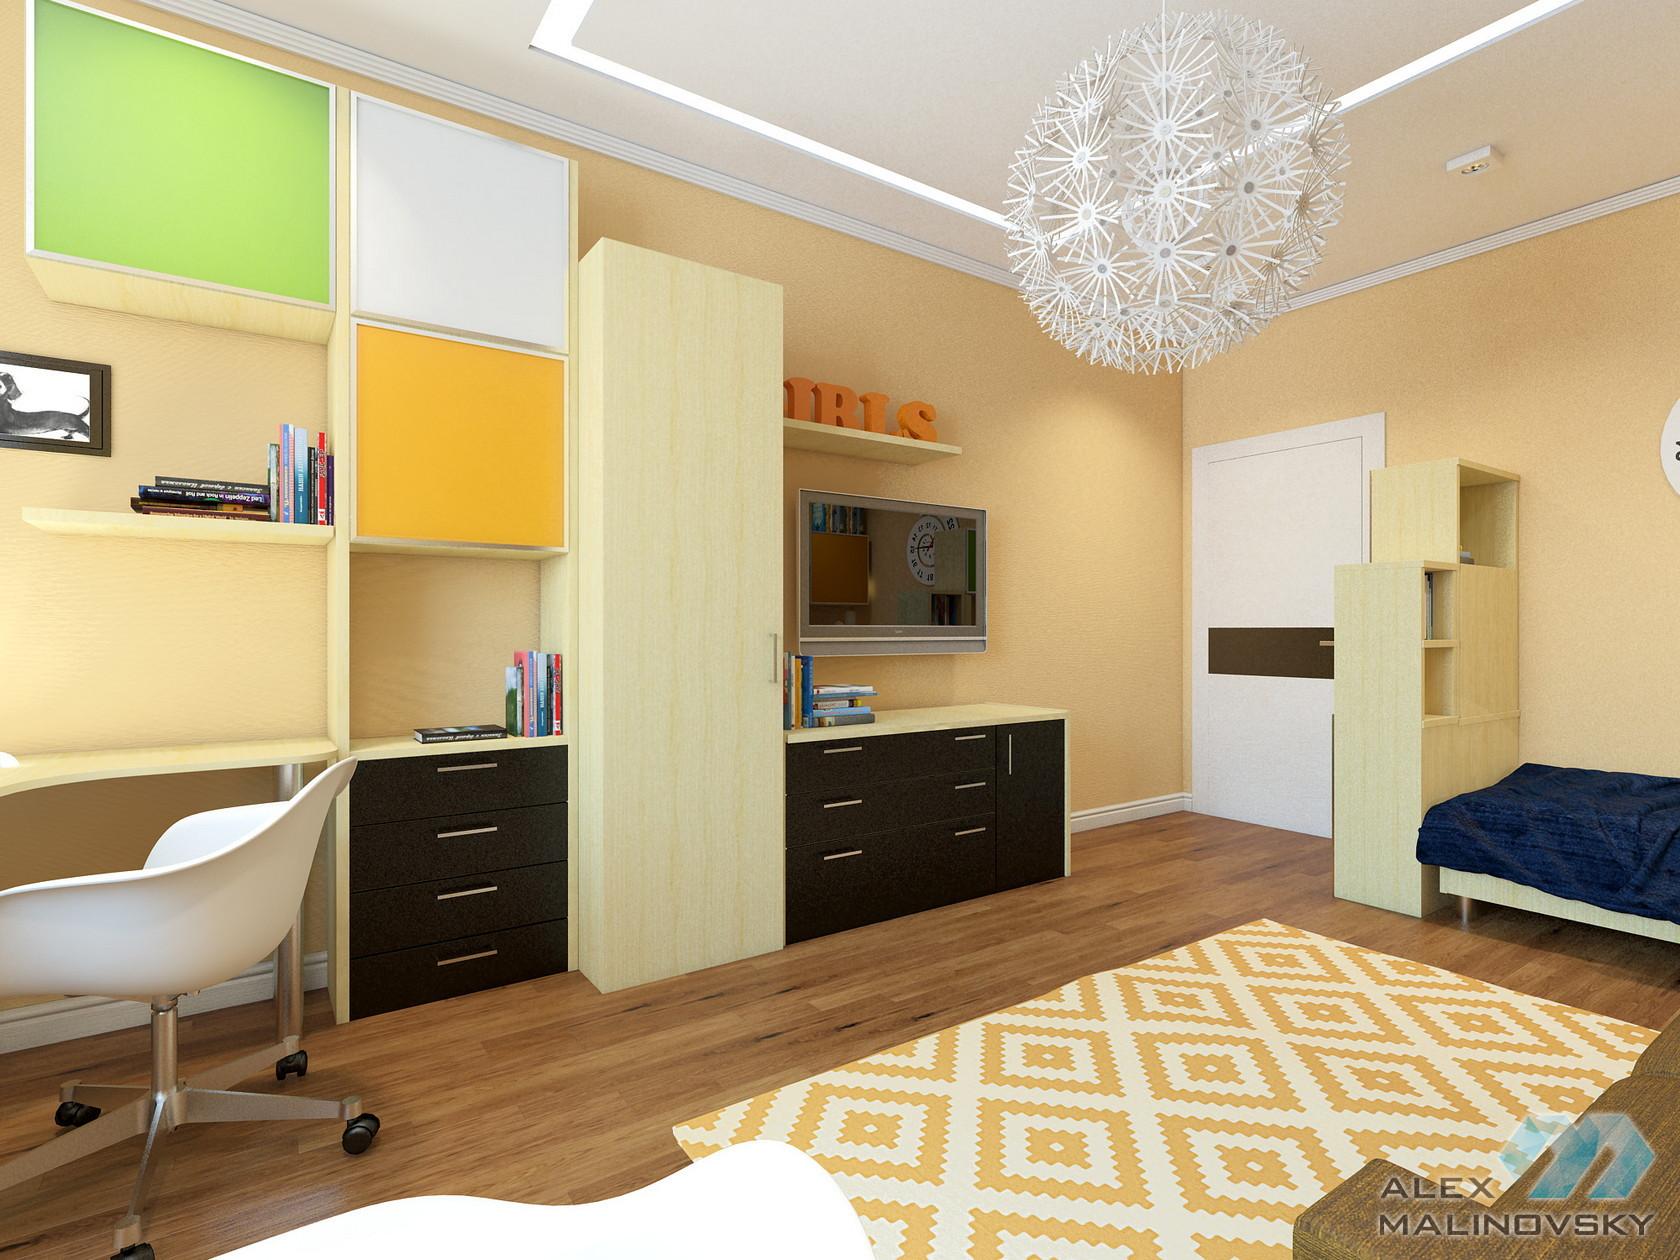 Детская 2, 3х комнатная квартира, ЖК Совхоз им Ленина, Москва